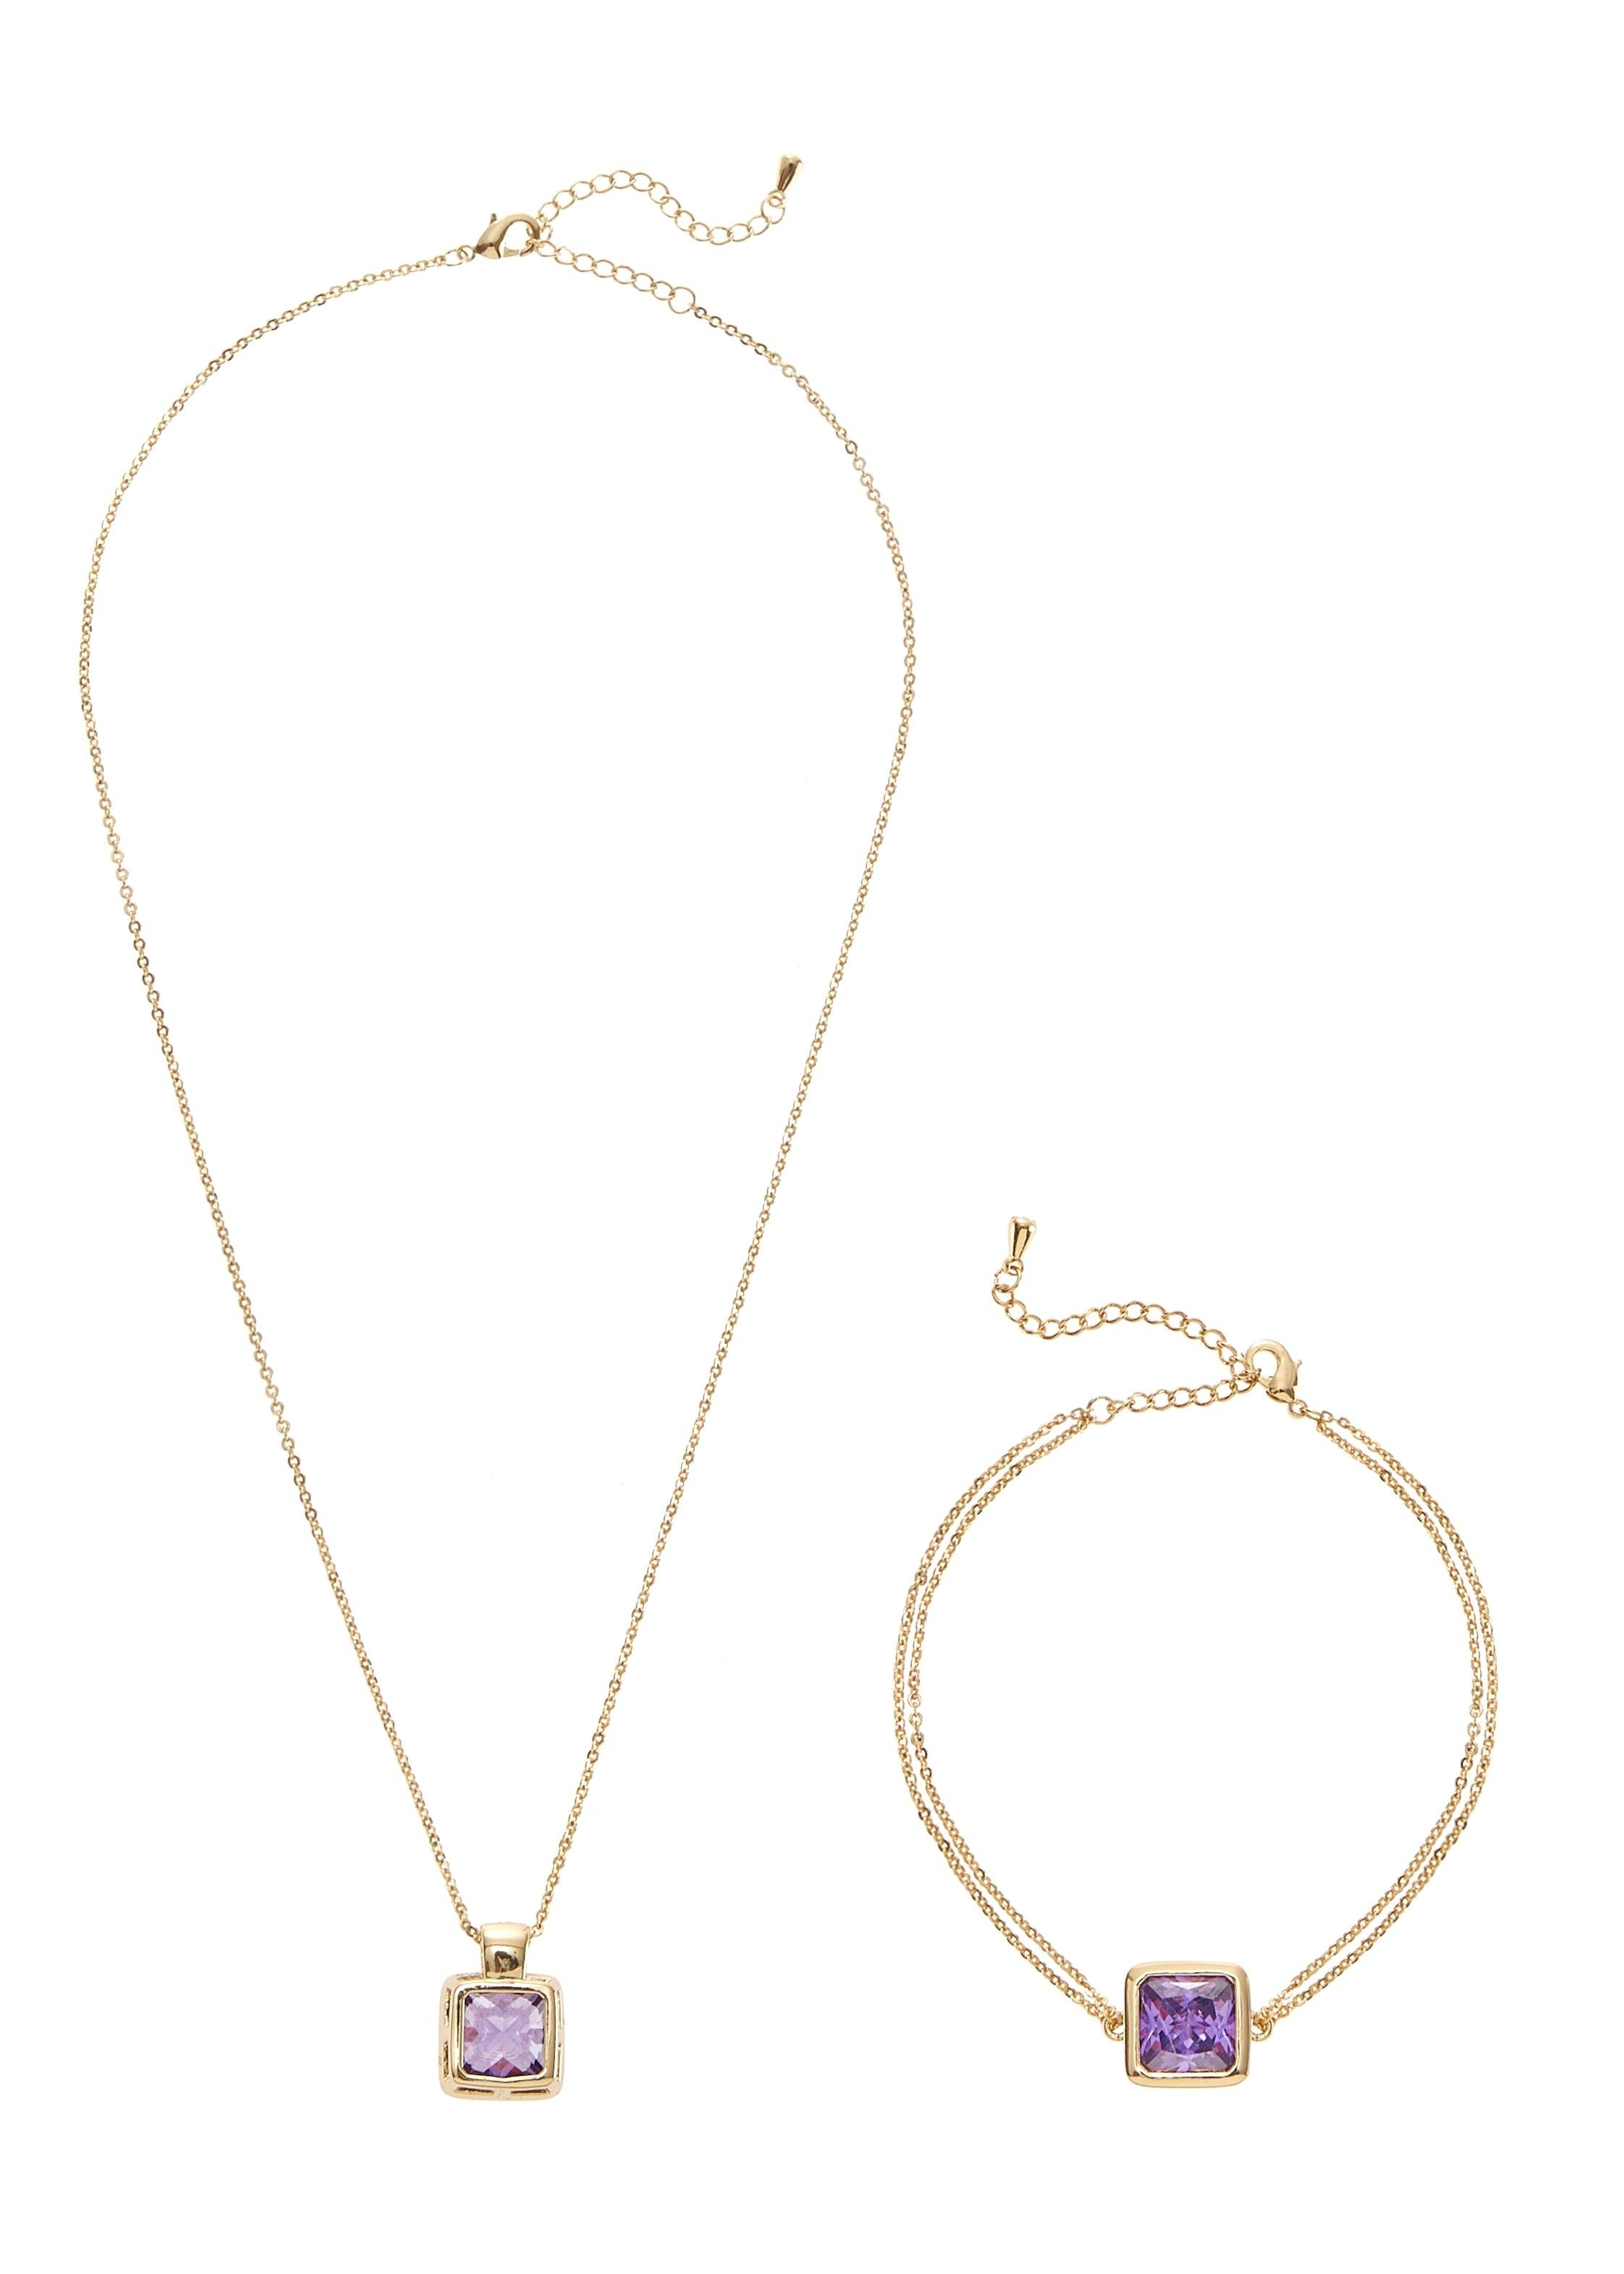 LASCANA armband en ketting (2-delige set) bij Lascana online kopen